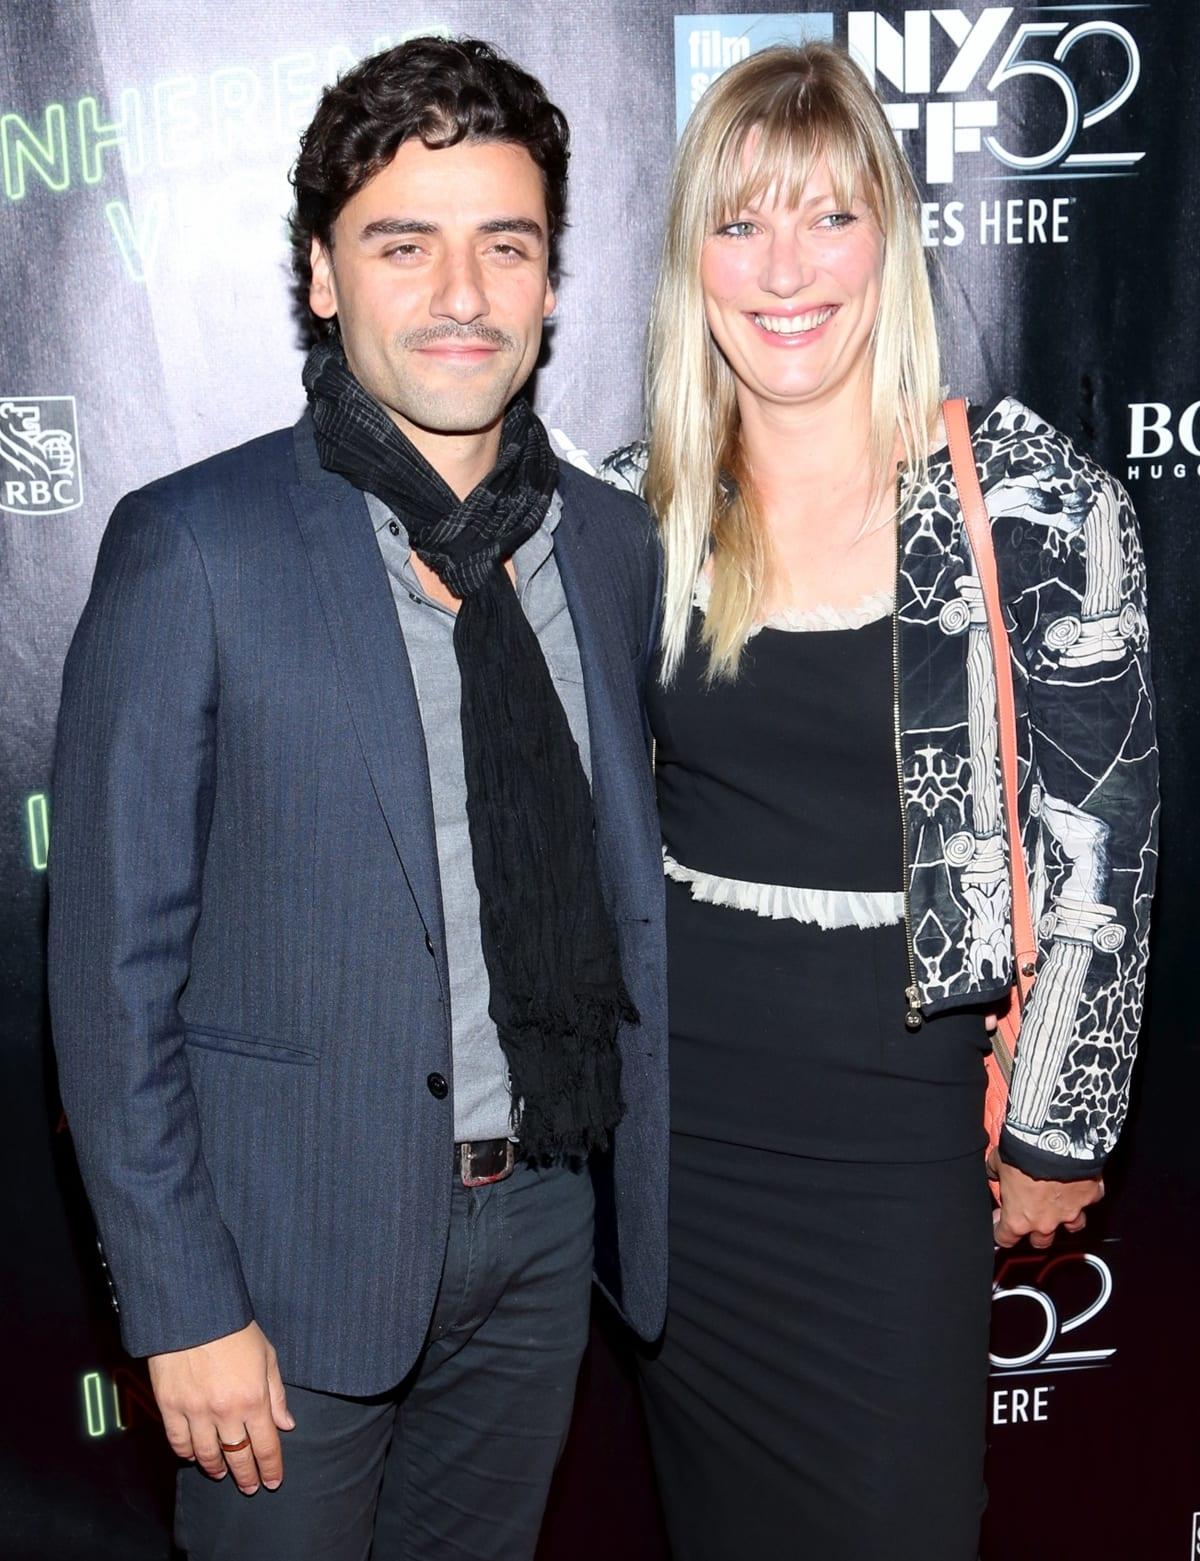 Oscar Isaac was reportedly engaged to childhood sweetheart Maria Miranda before he met Elvira Lind